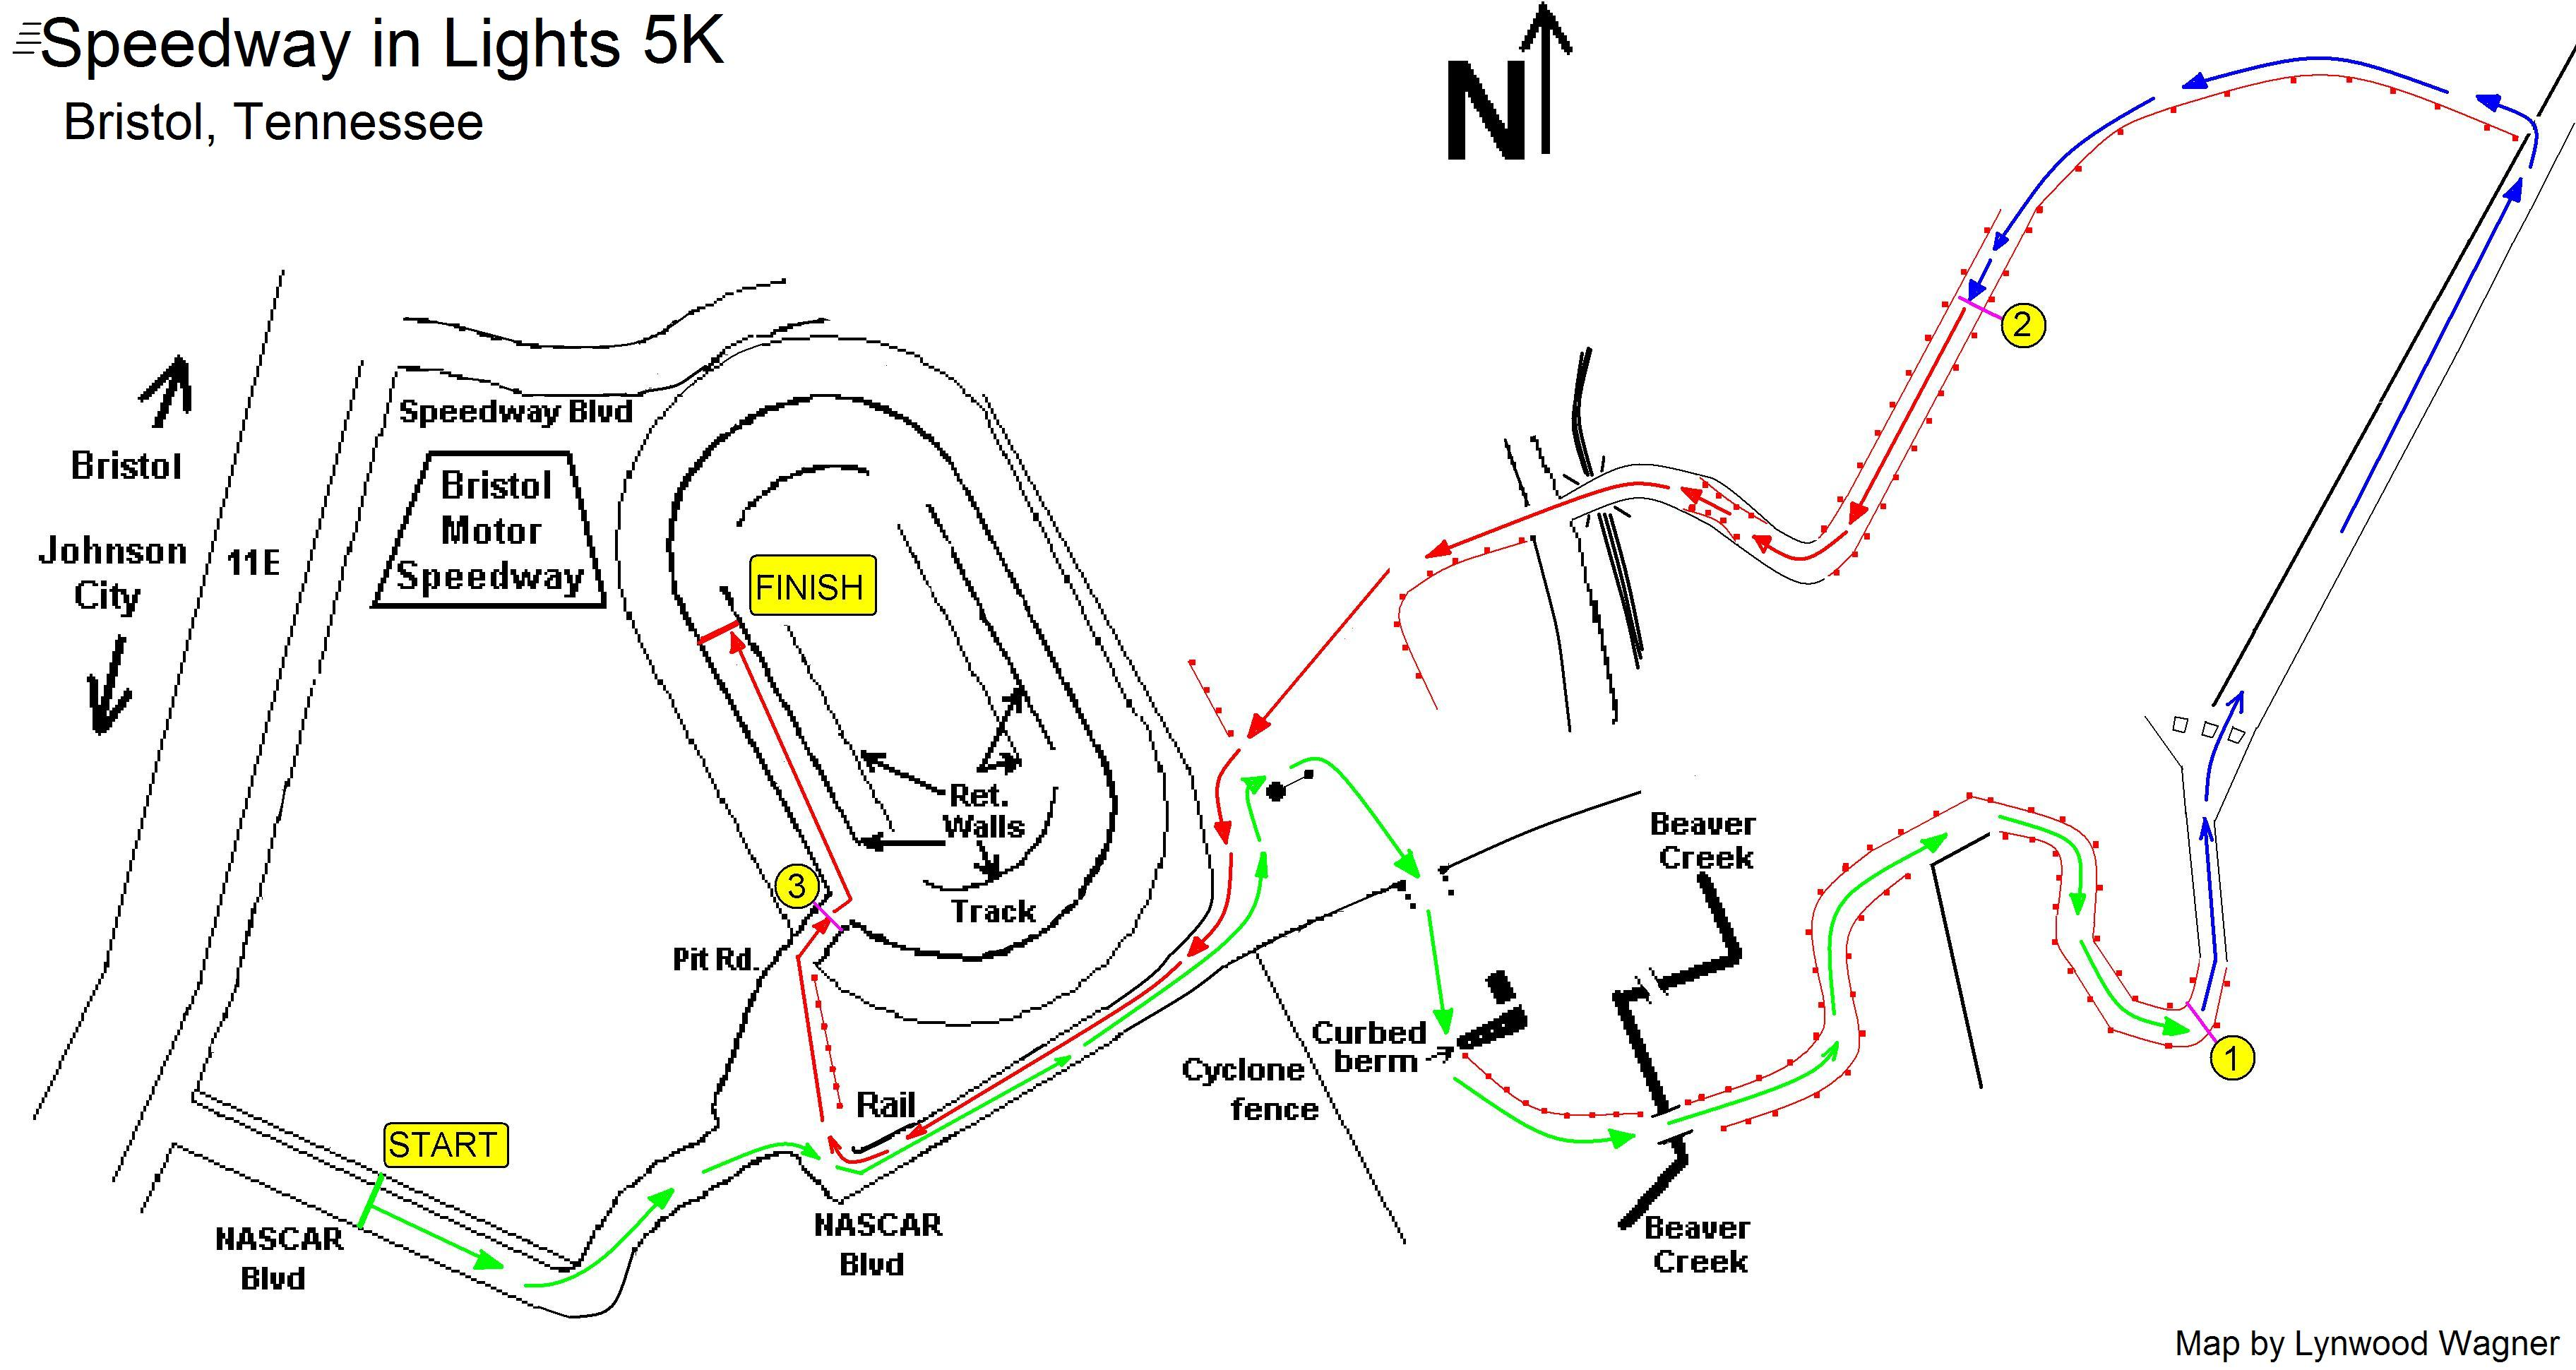 Sftc event calendar for Bristol motor speedway 5k 2017